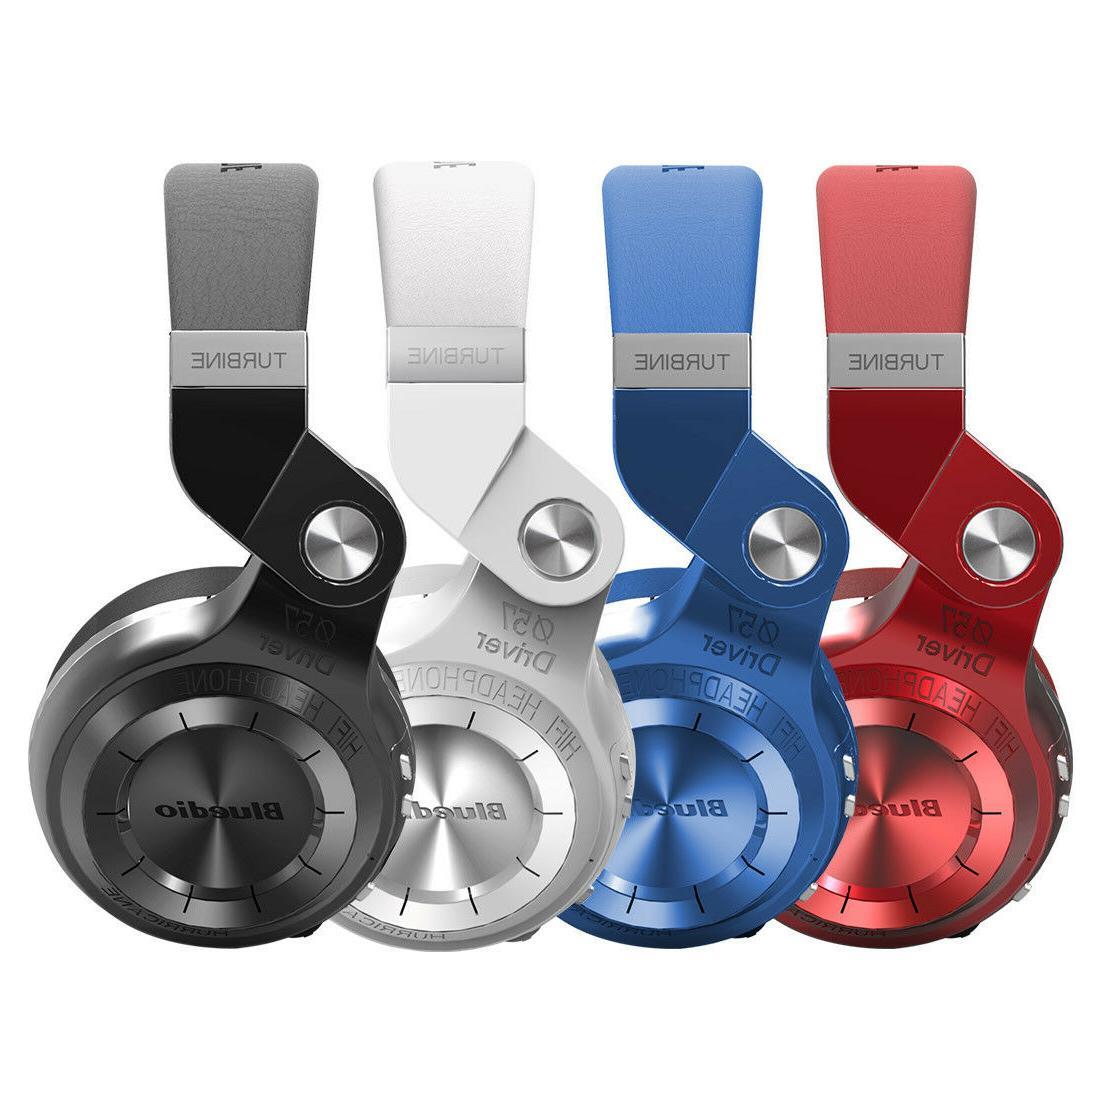 t2s turbine bluetooth headphones stereo microphone wireless